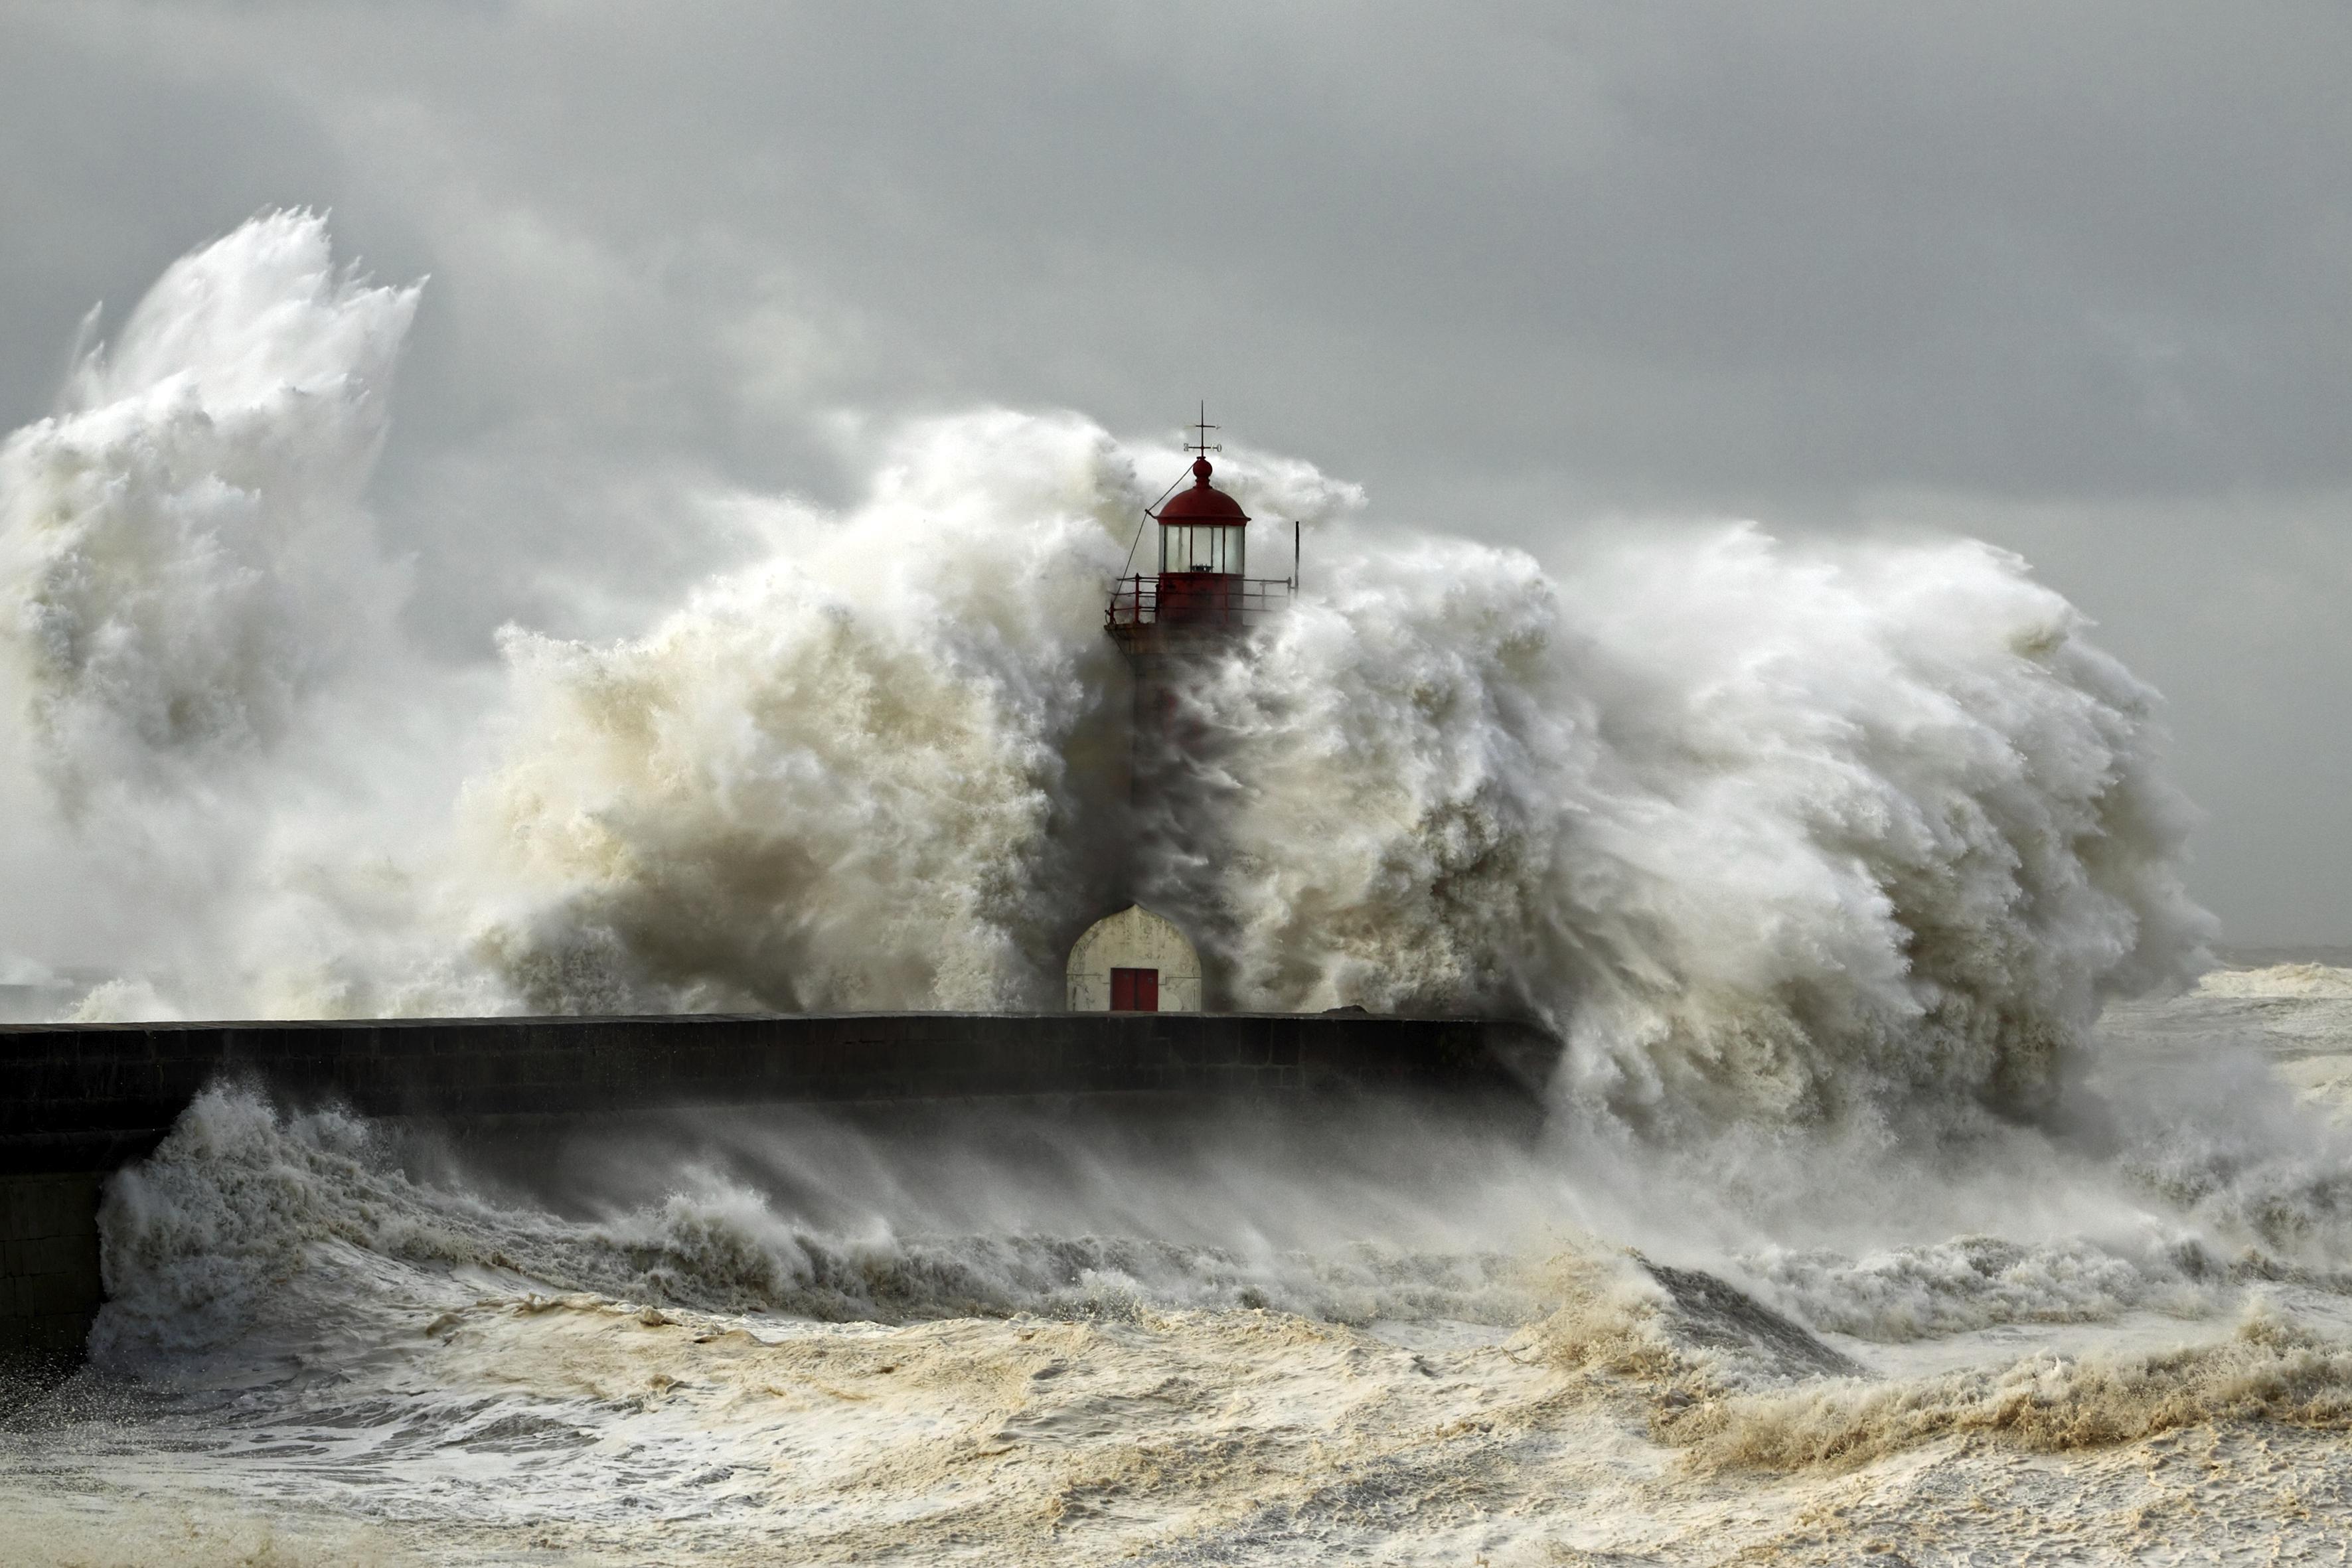 Storm Ewan is coming